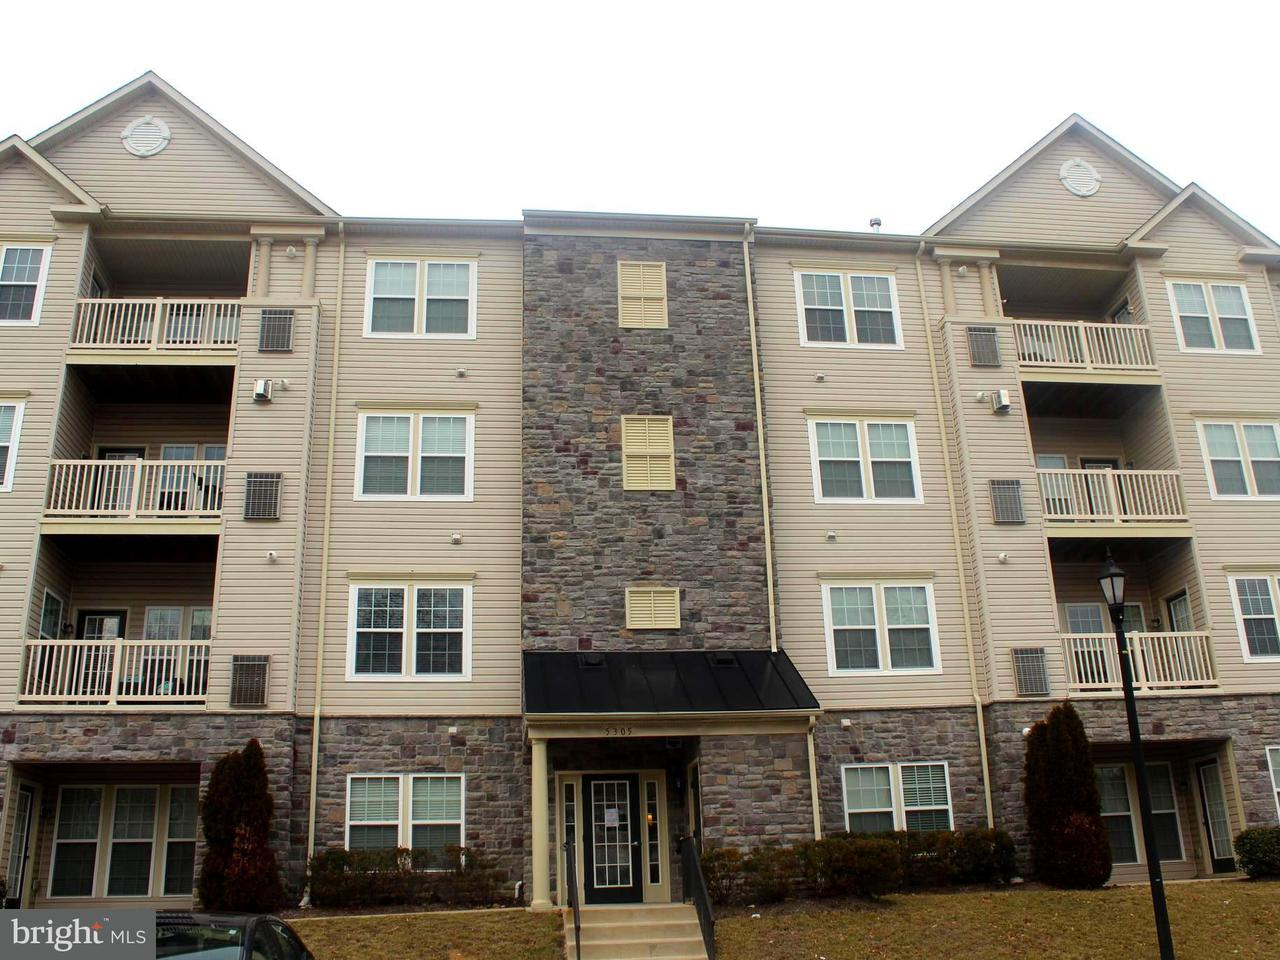 Condominium for Rent at 5305 Wyndholme Cir #304 Baltimore, Maryland 21229 United States